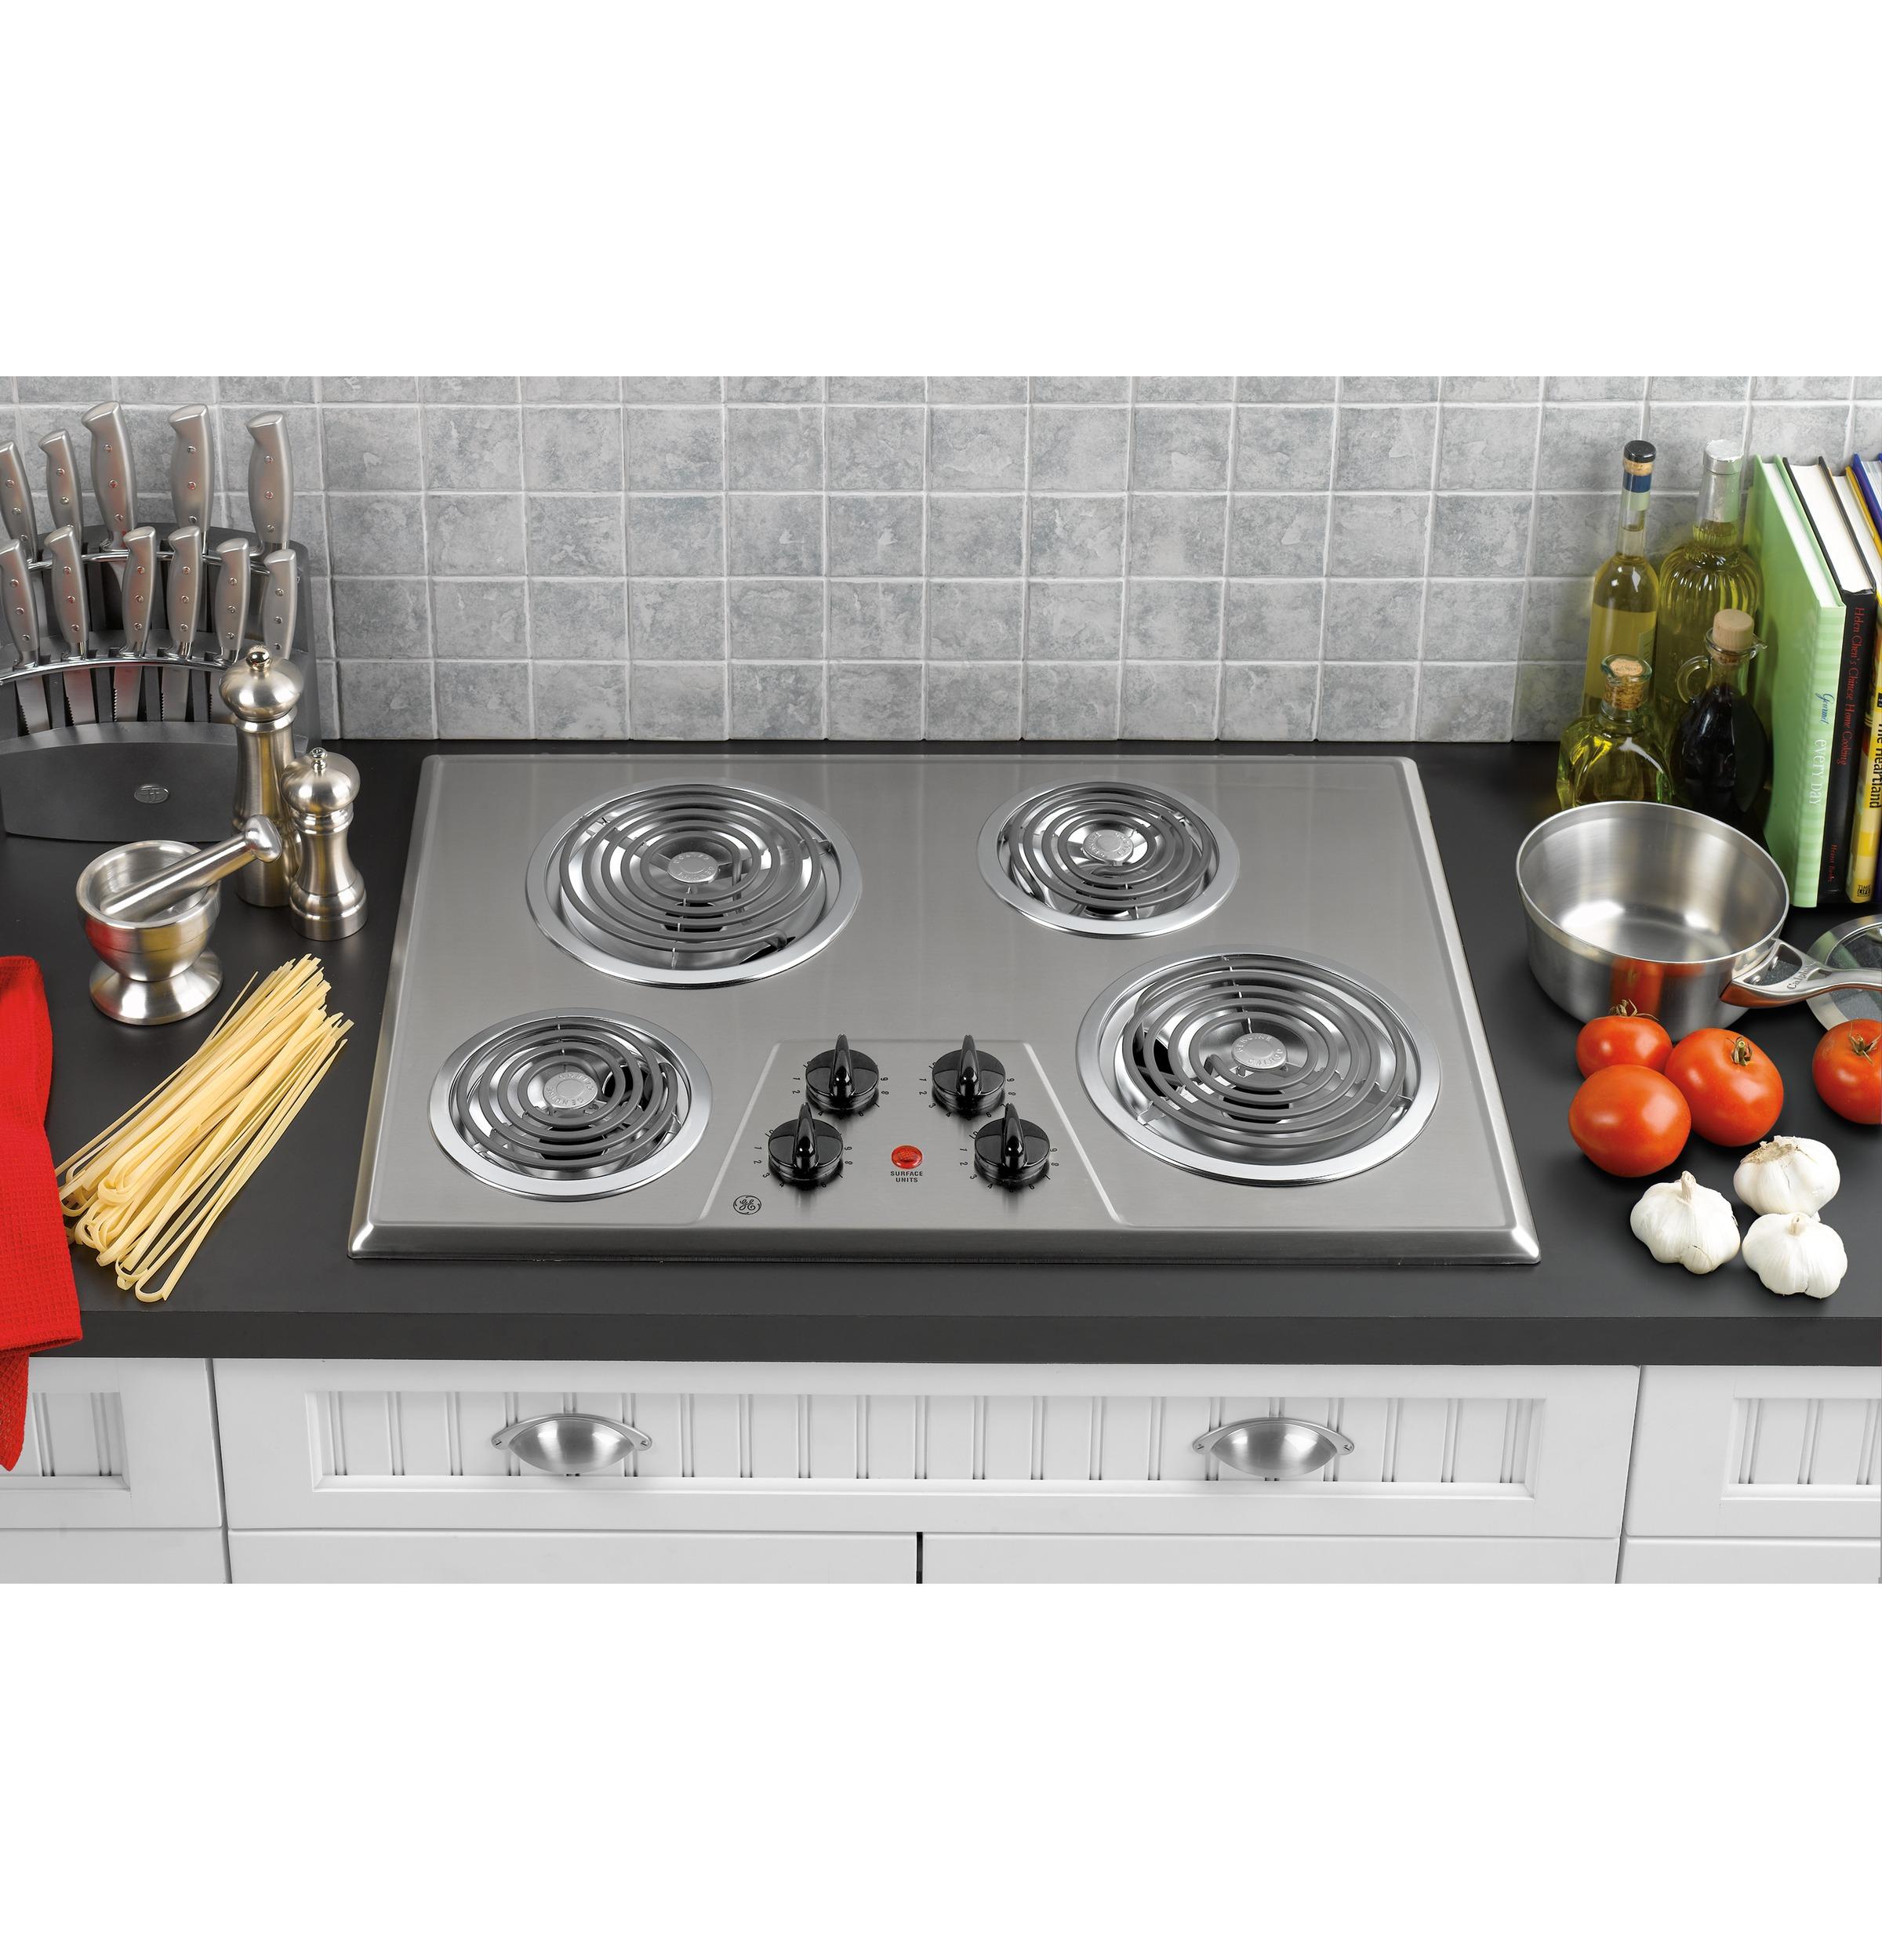 "GE 30"" Built-In Electric Cooktop"